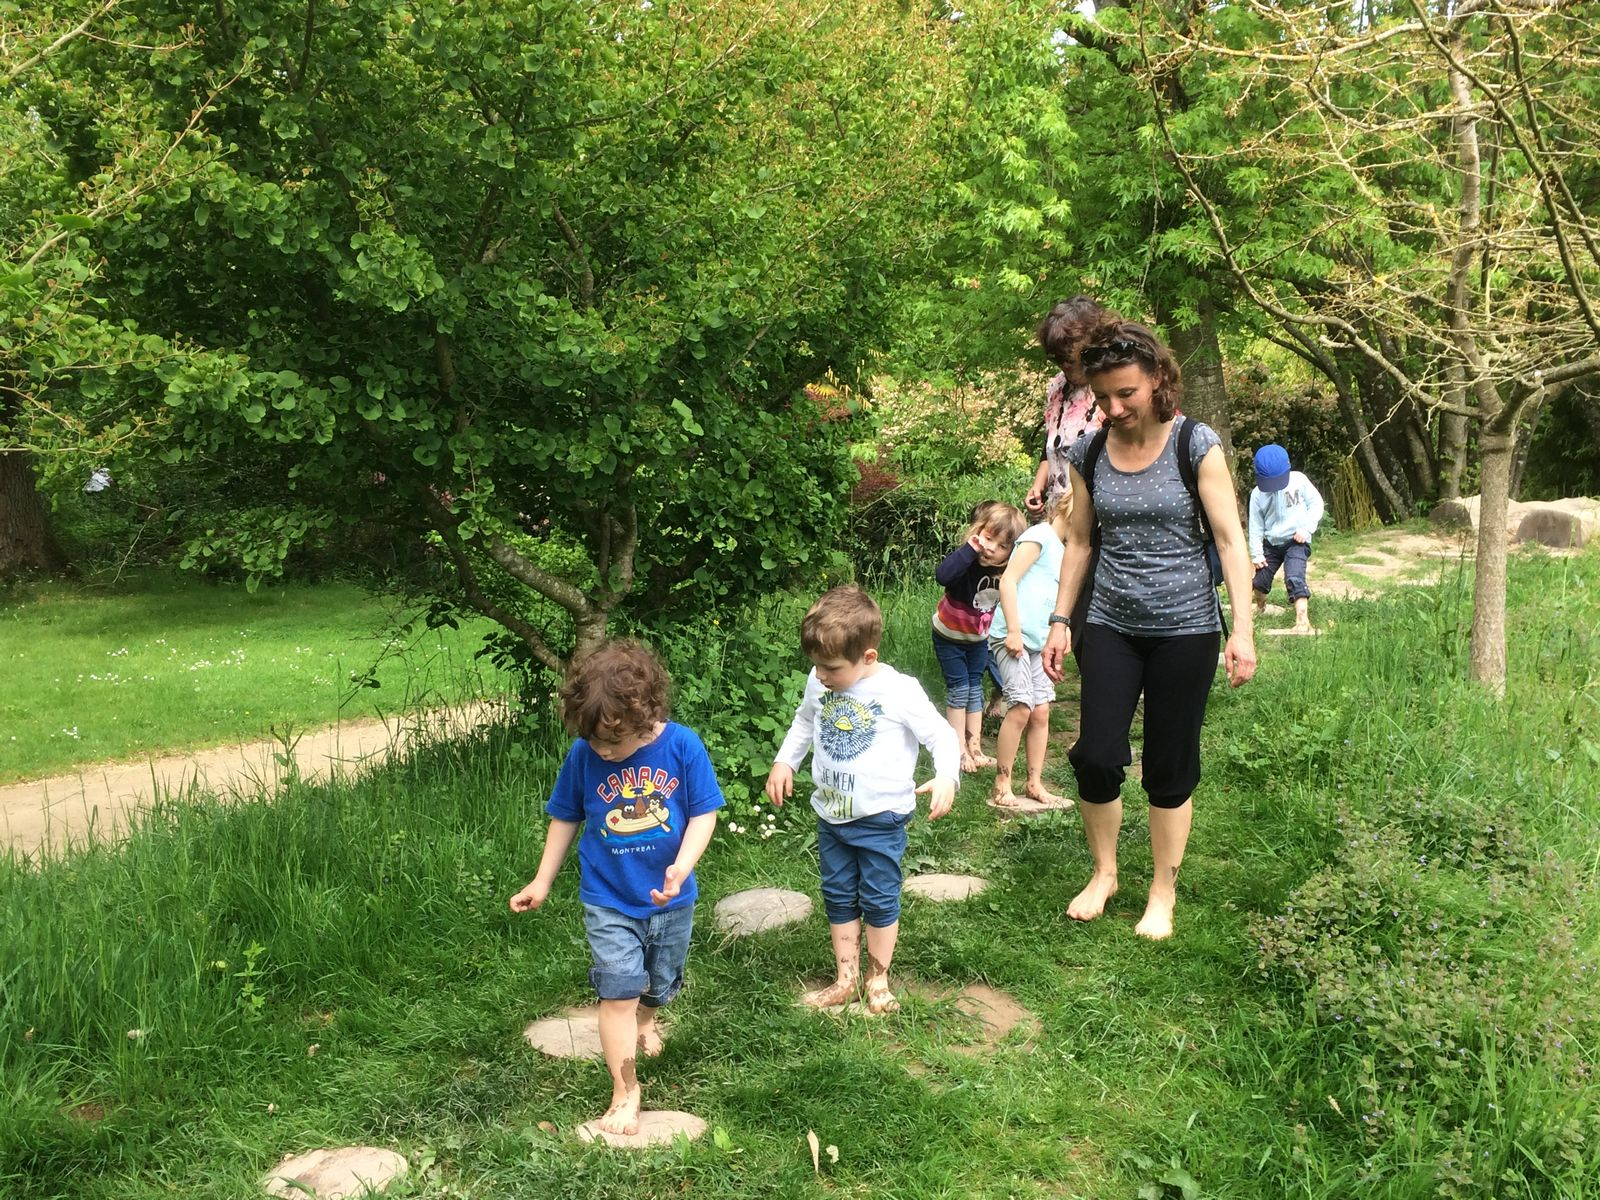 La sortie aux jardins de Brocéliande Ecole primaire Janusz Korczak